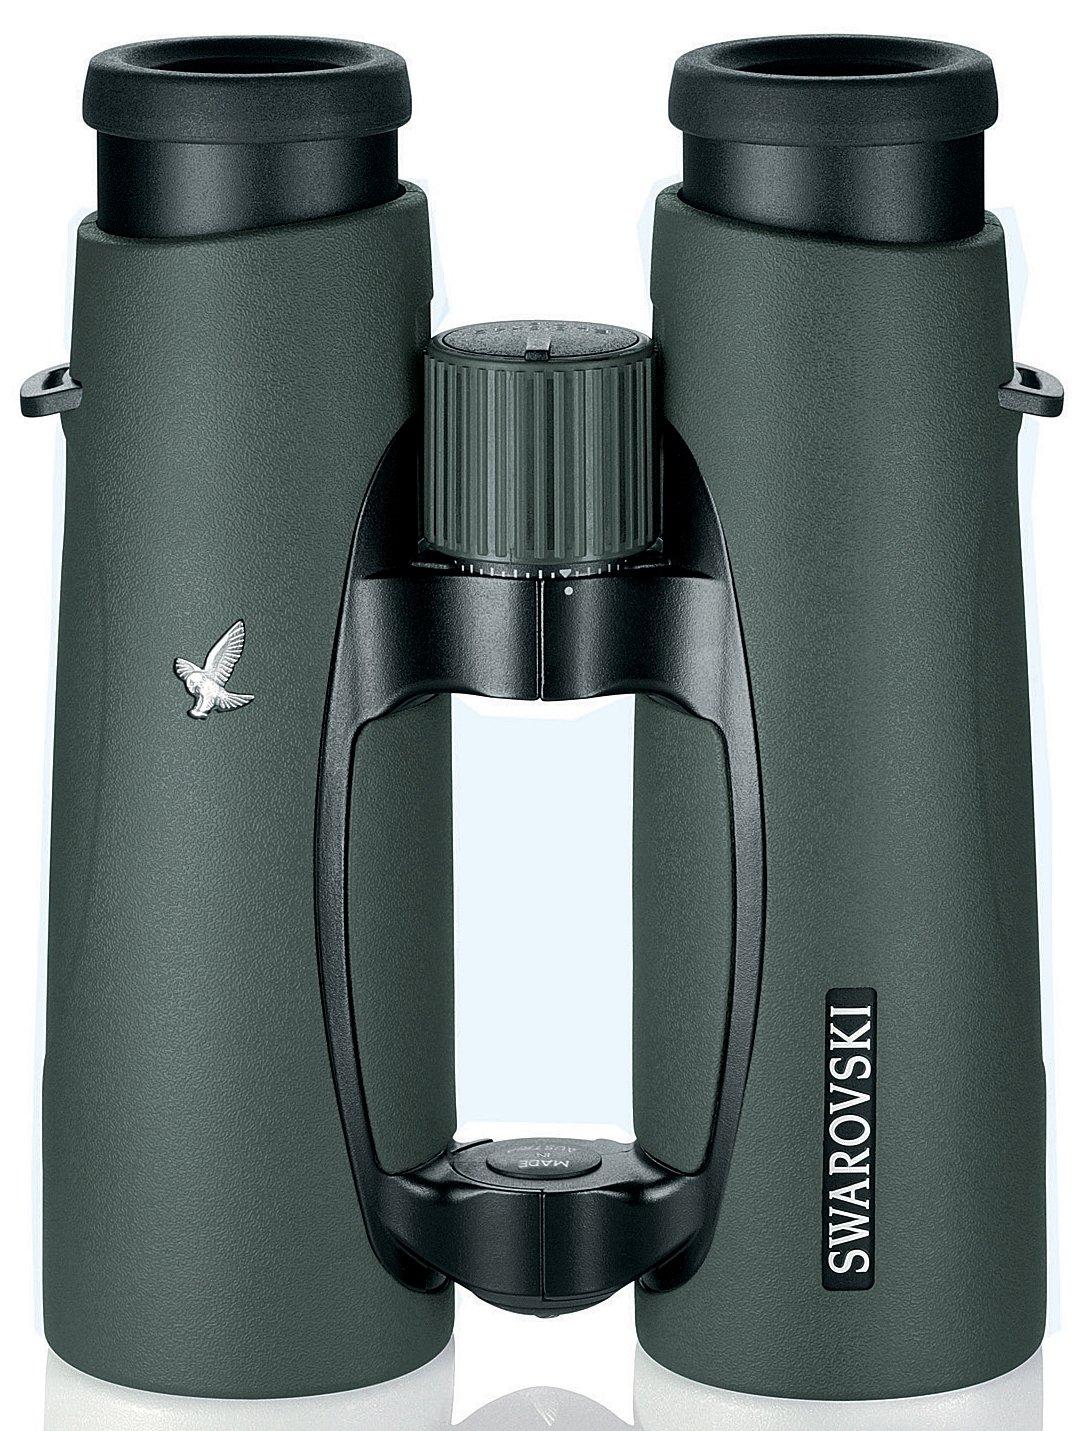 Swarovski Optik El Swarovision Binoculars